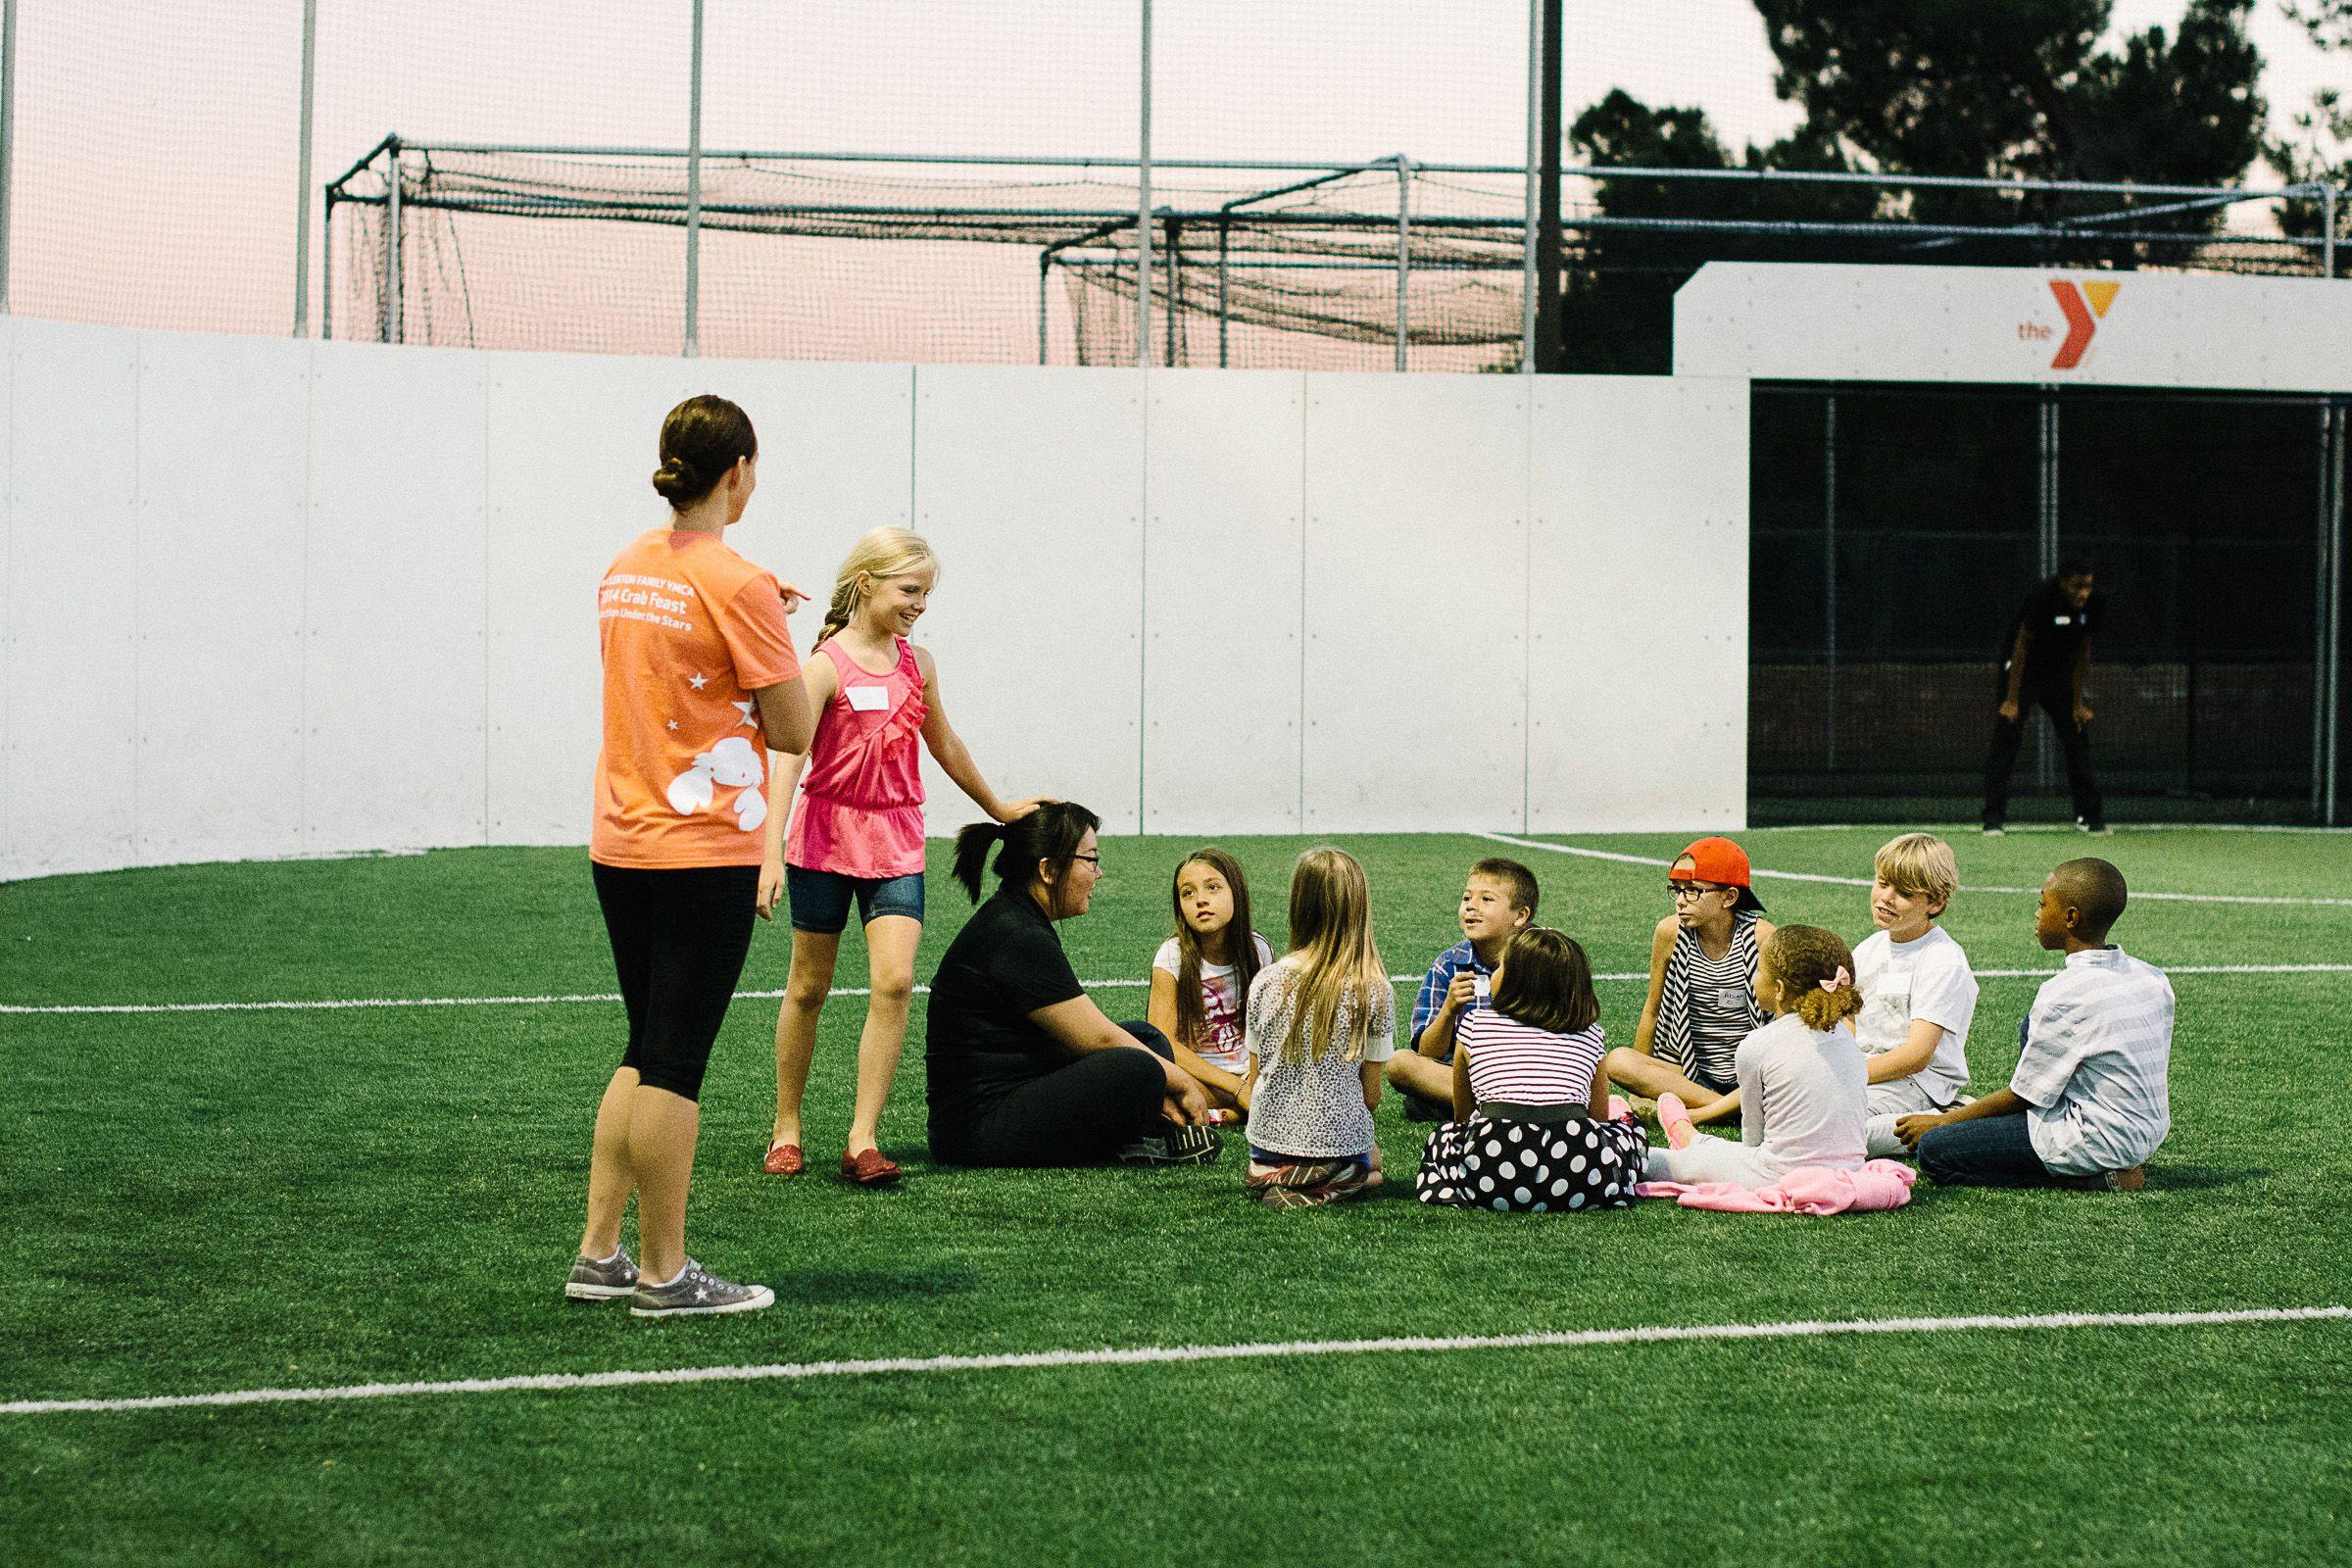 Single Moms Event With Air 1 Radio At The Fullerton Ymca Ymcaoc Ymcaocfn Fullerton Ymca Soccer Field Fullerton